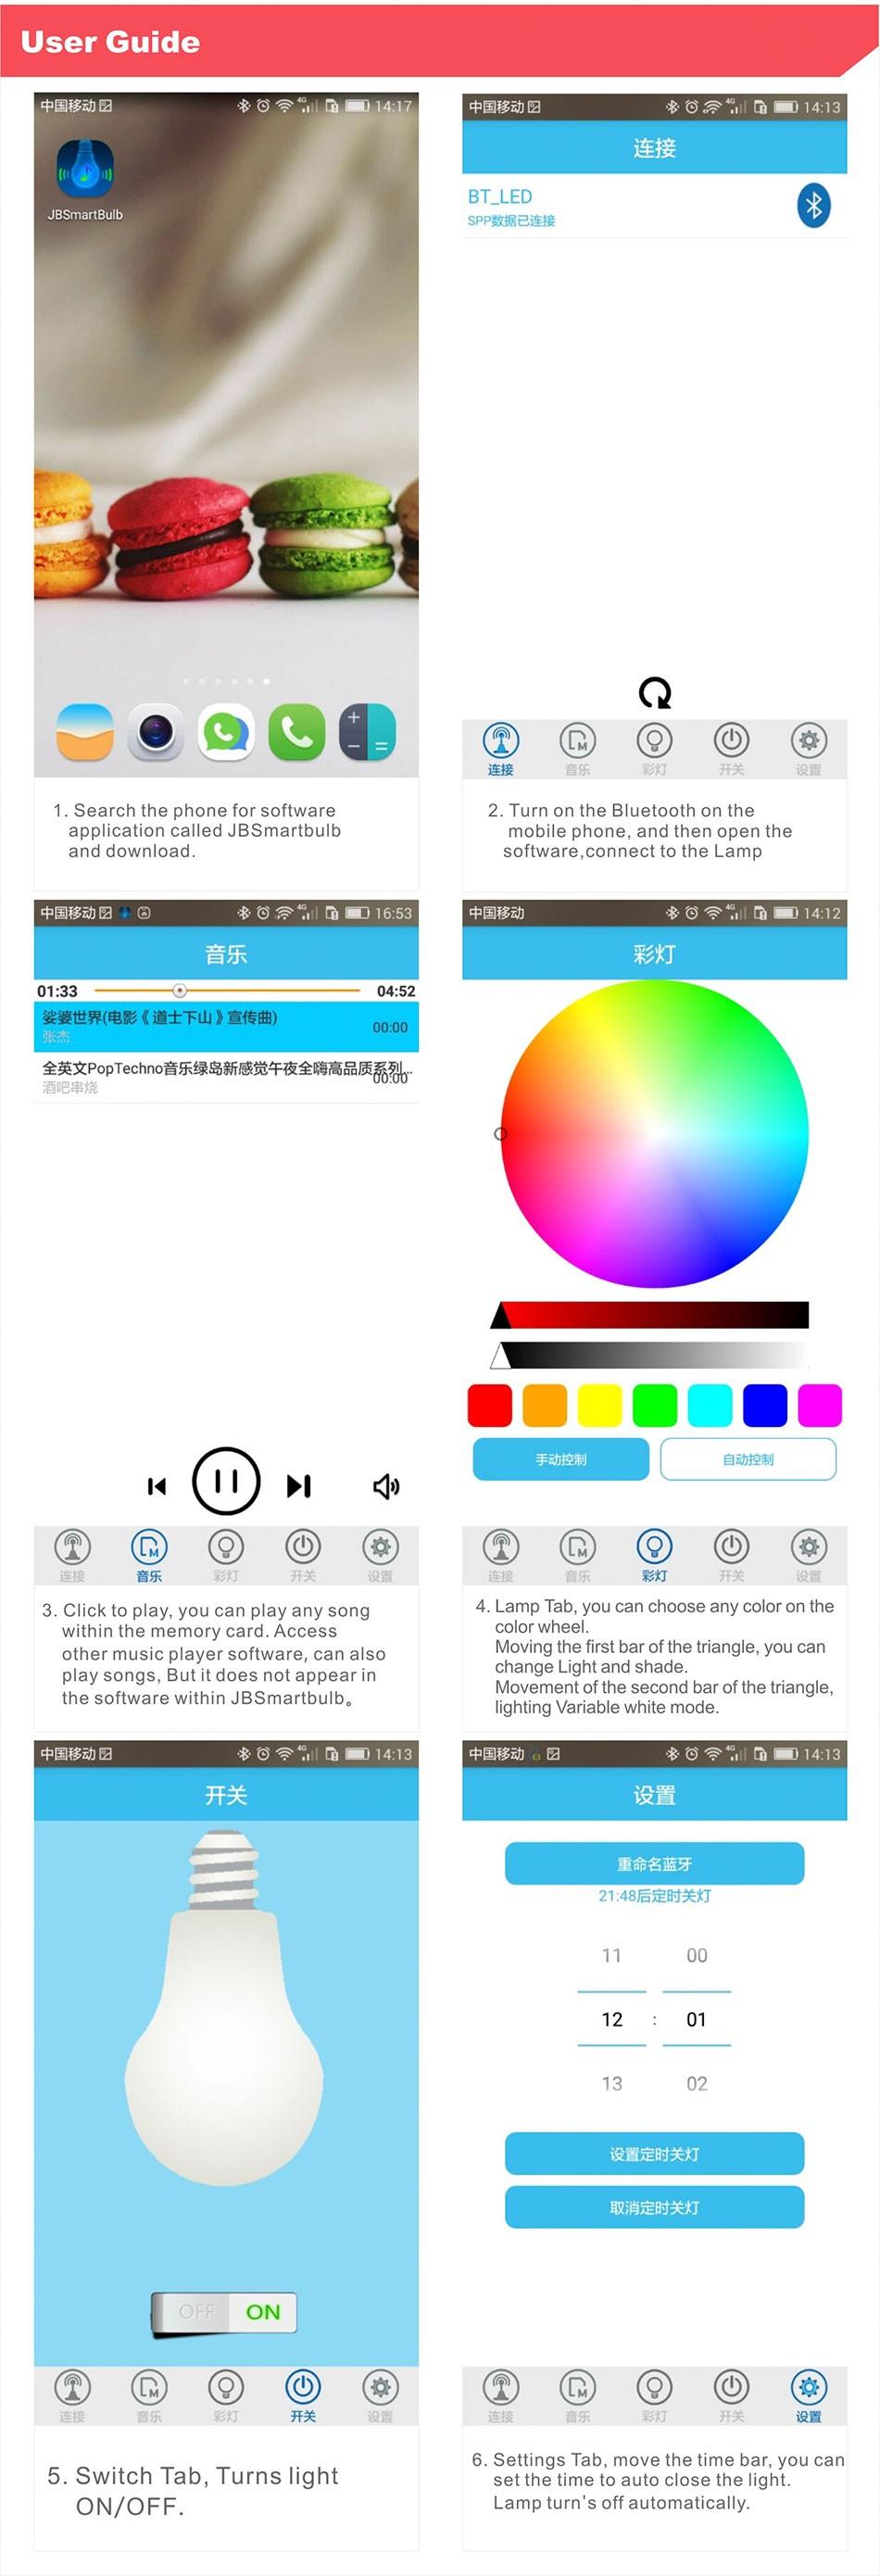 CNHIDEE USB Novelty Star Wars Bluetooth Music Desk Lampara 3D Stormtrooper Bulbing Led Luz de Noche Engraving Night Light Decor as Creative Gifs  (13)